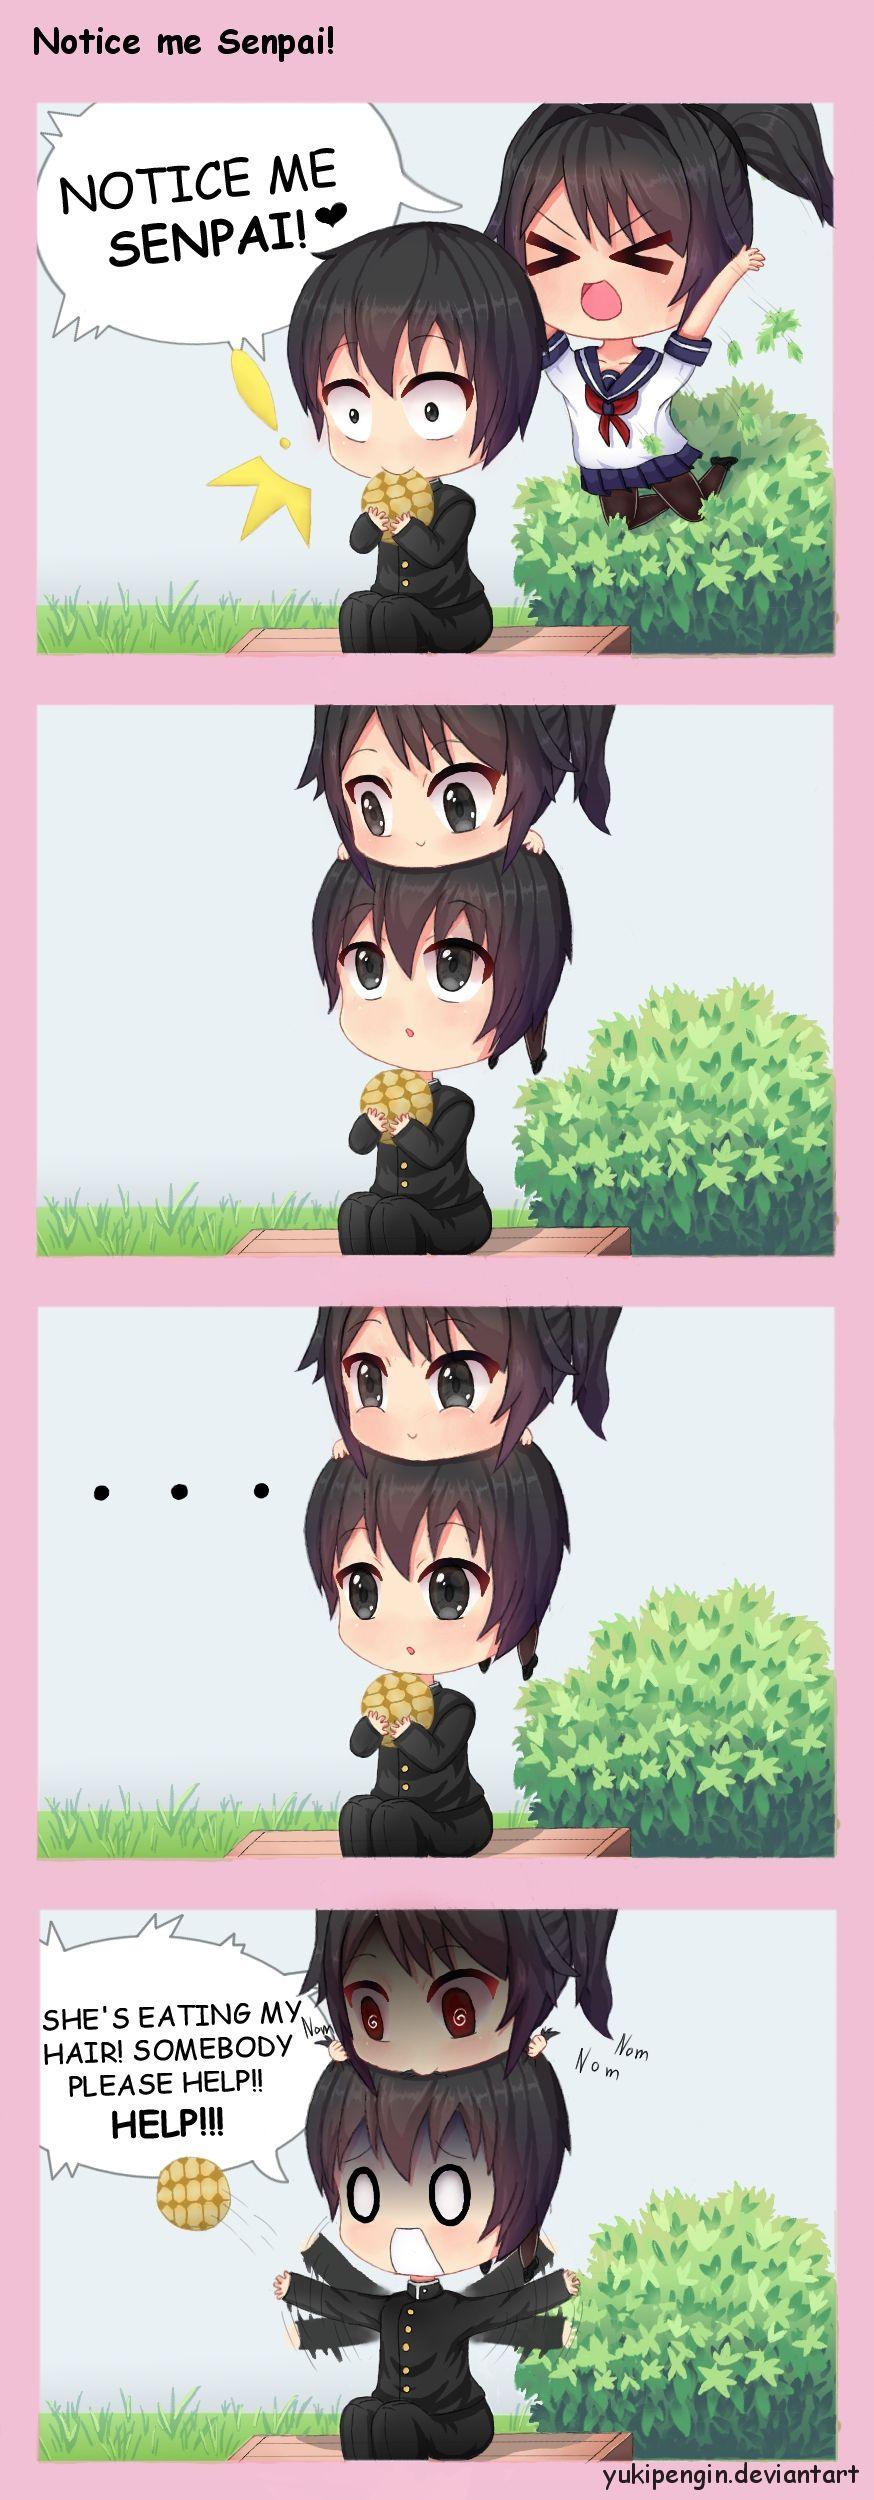 Notice me Senpai! by Yukipengin on DeviantArt Animes yandere